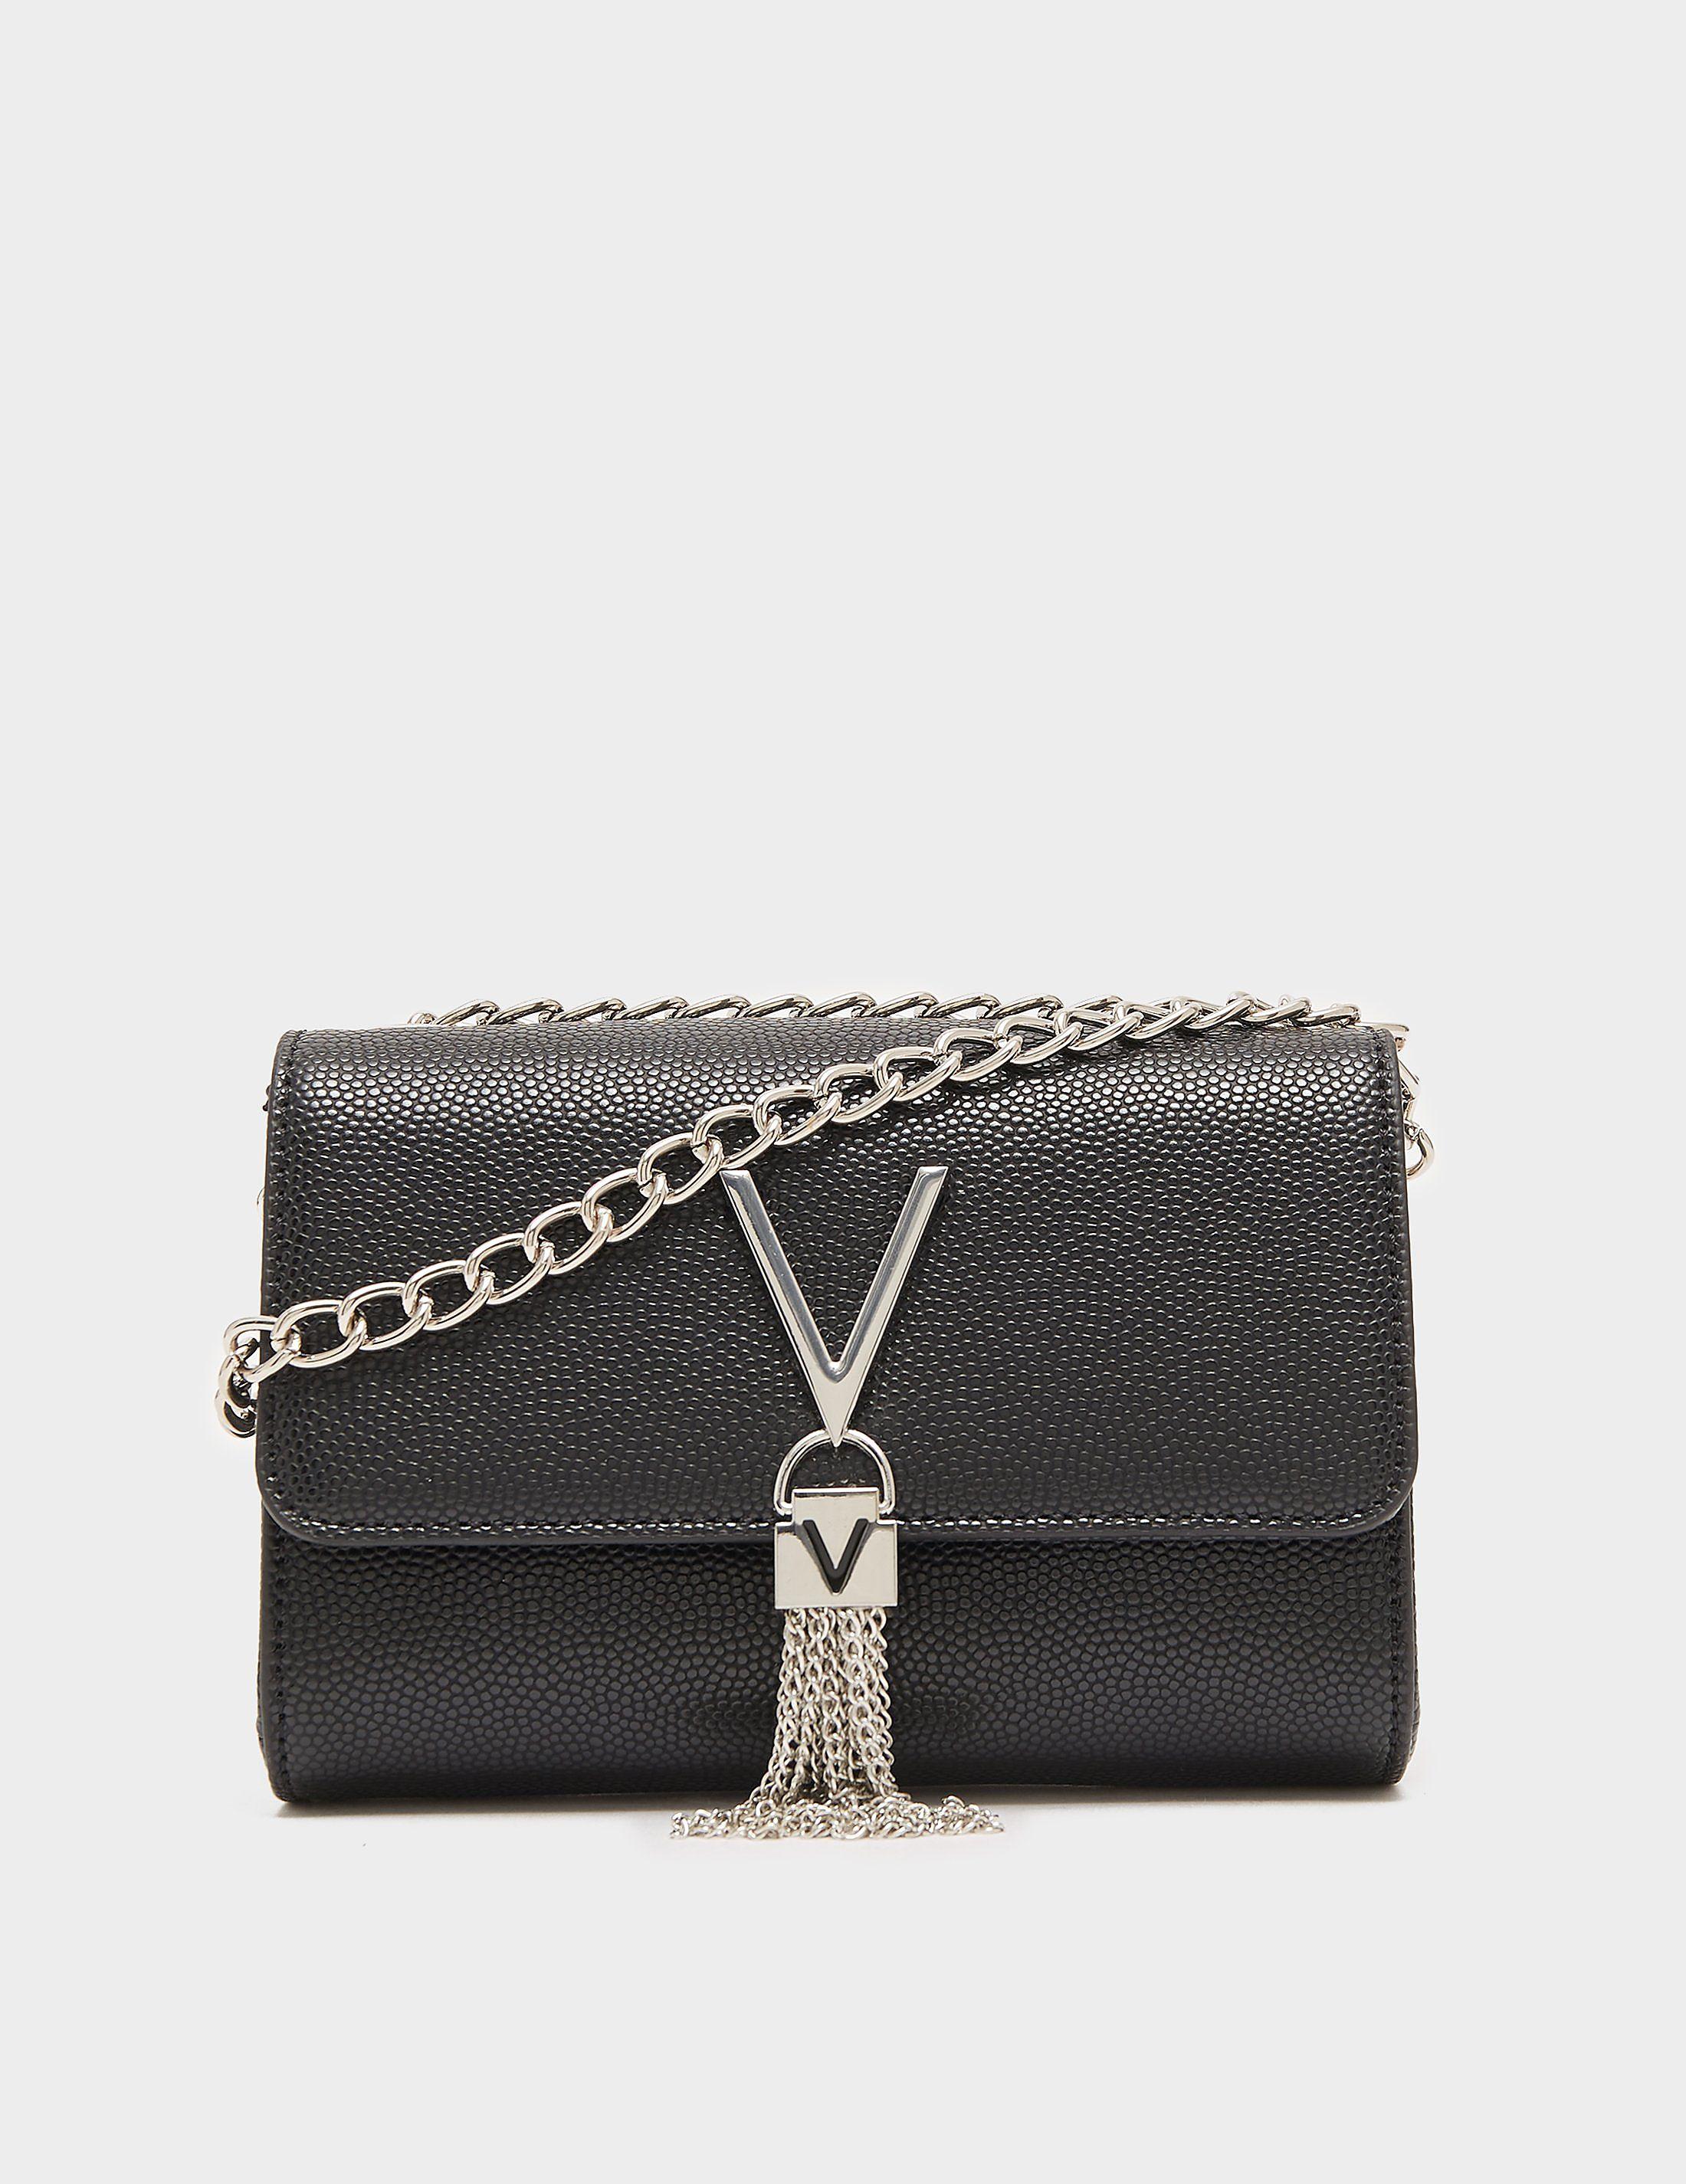 free shipping f1b2e d7a54 Valentino by Mario Valentino Divina Chain Shoulder Bag | Tessuti